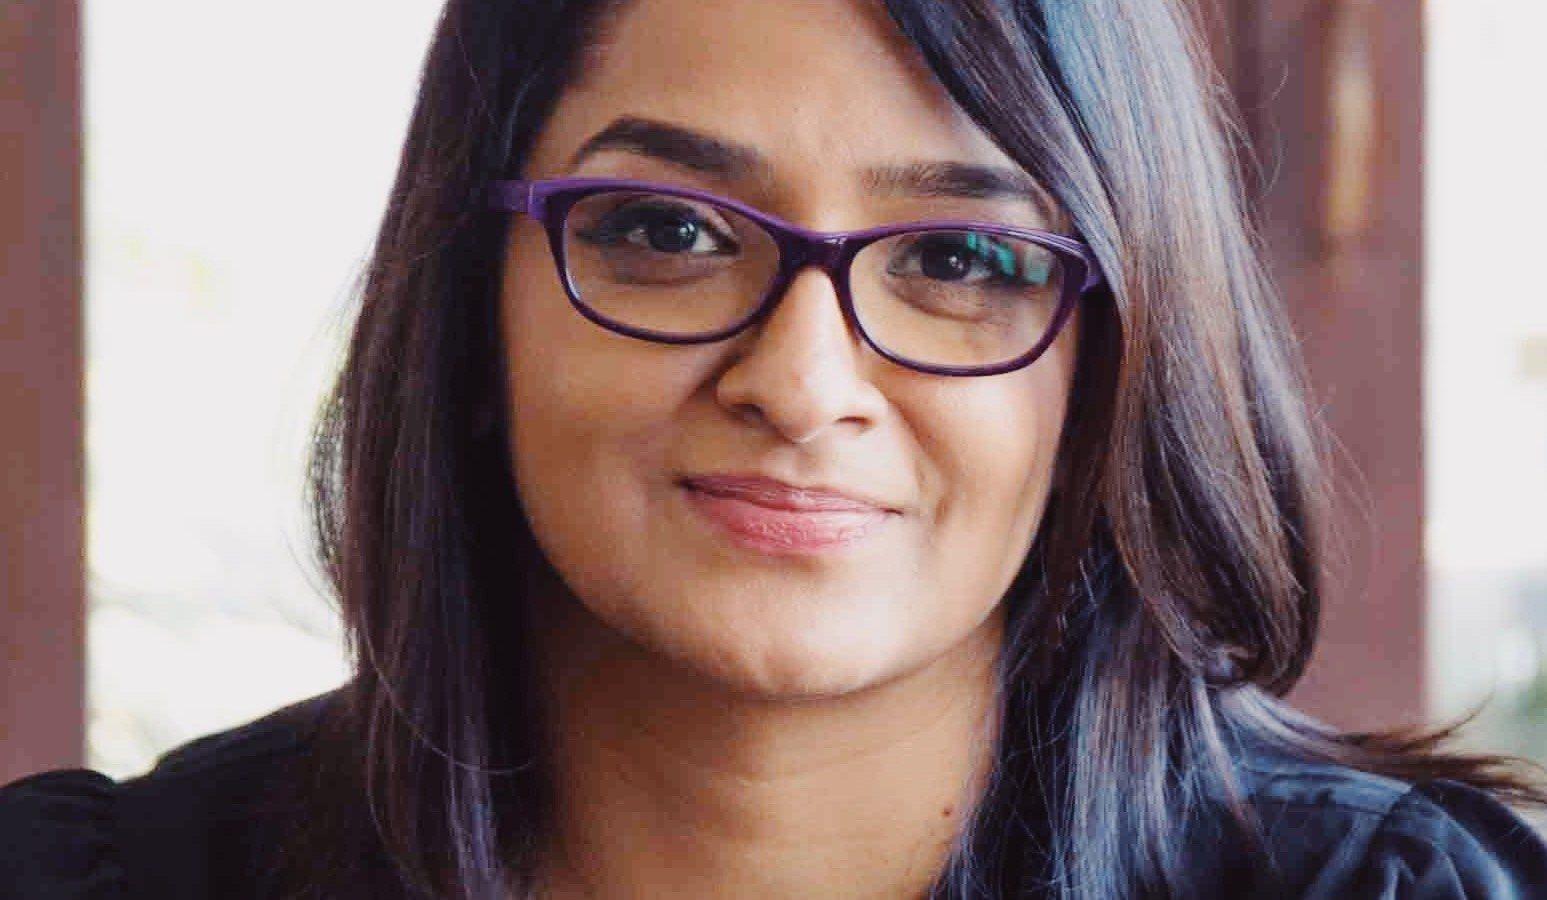 3 Minutes with Ashwini Asokan 🇮🇳